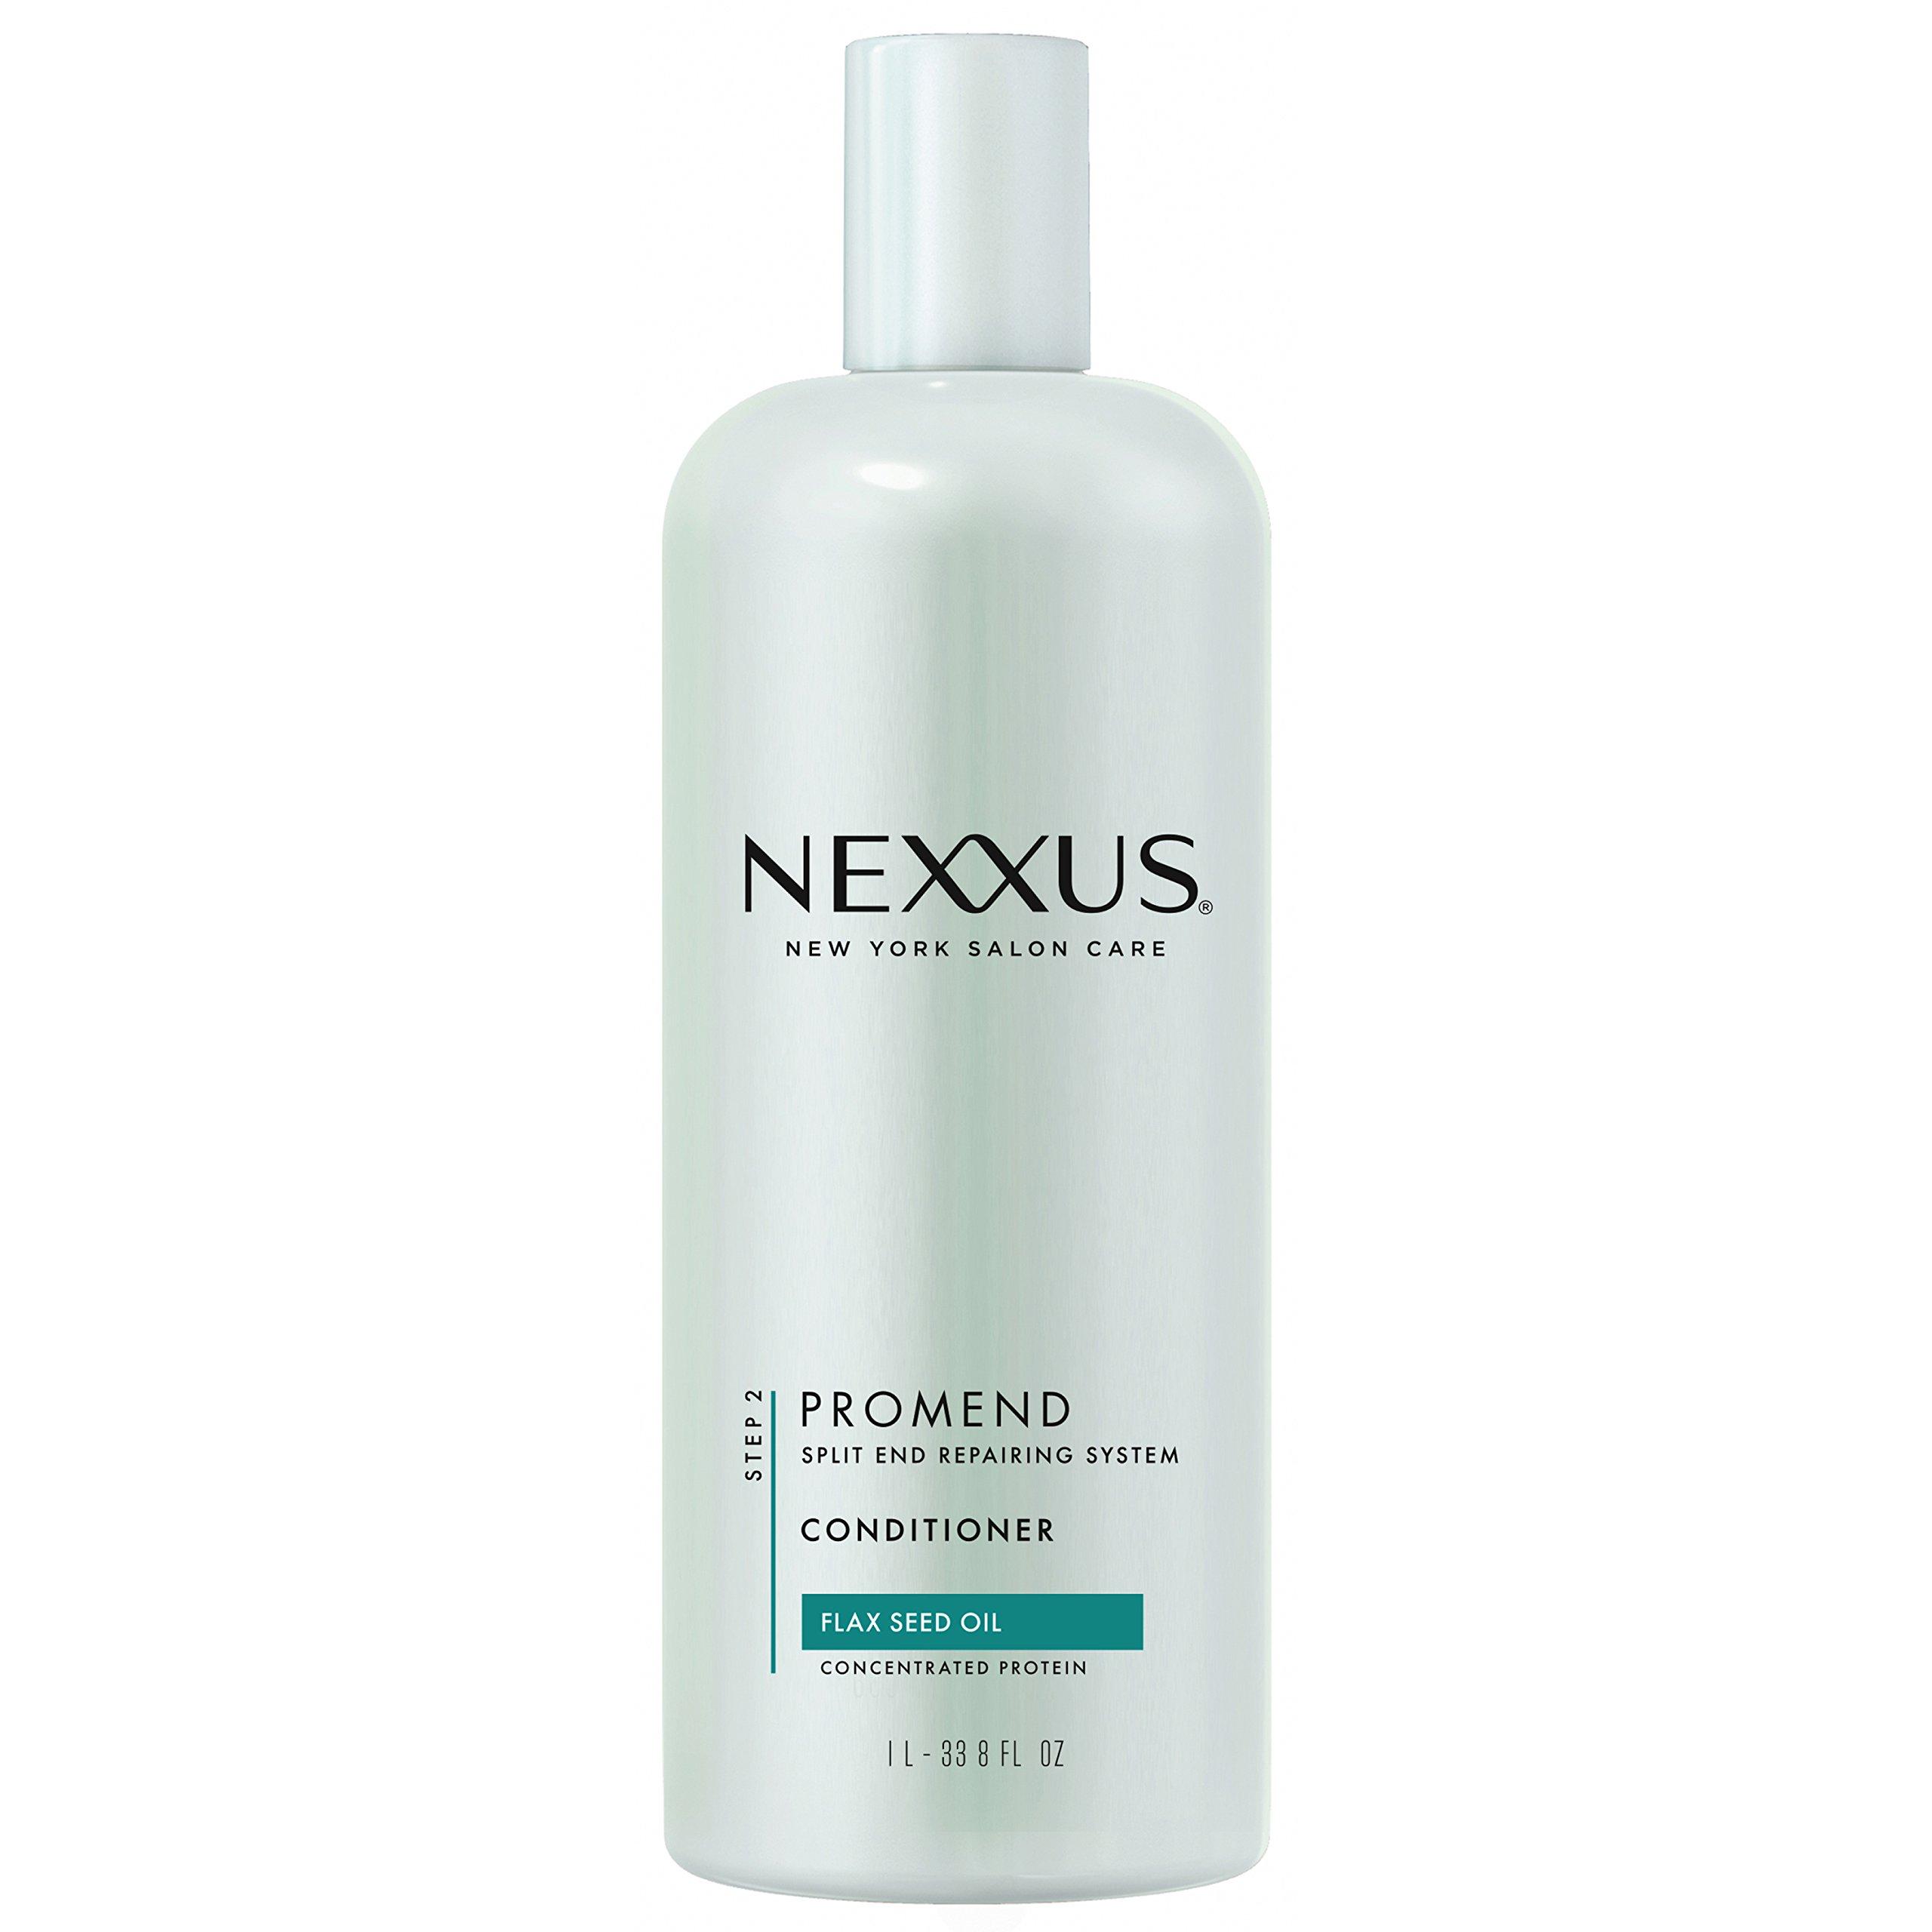 Nexxus Promend Conditioner, for Hair Prone to Split Ends 33.8 oz